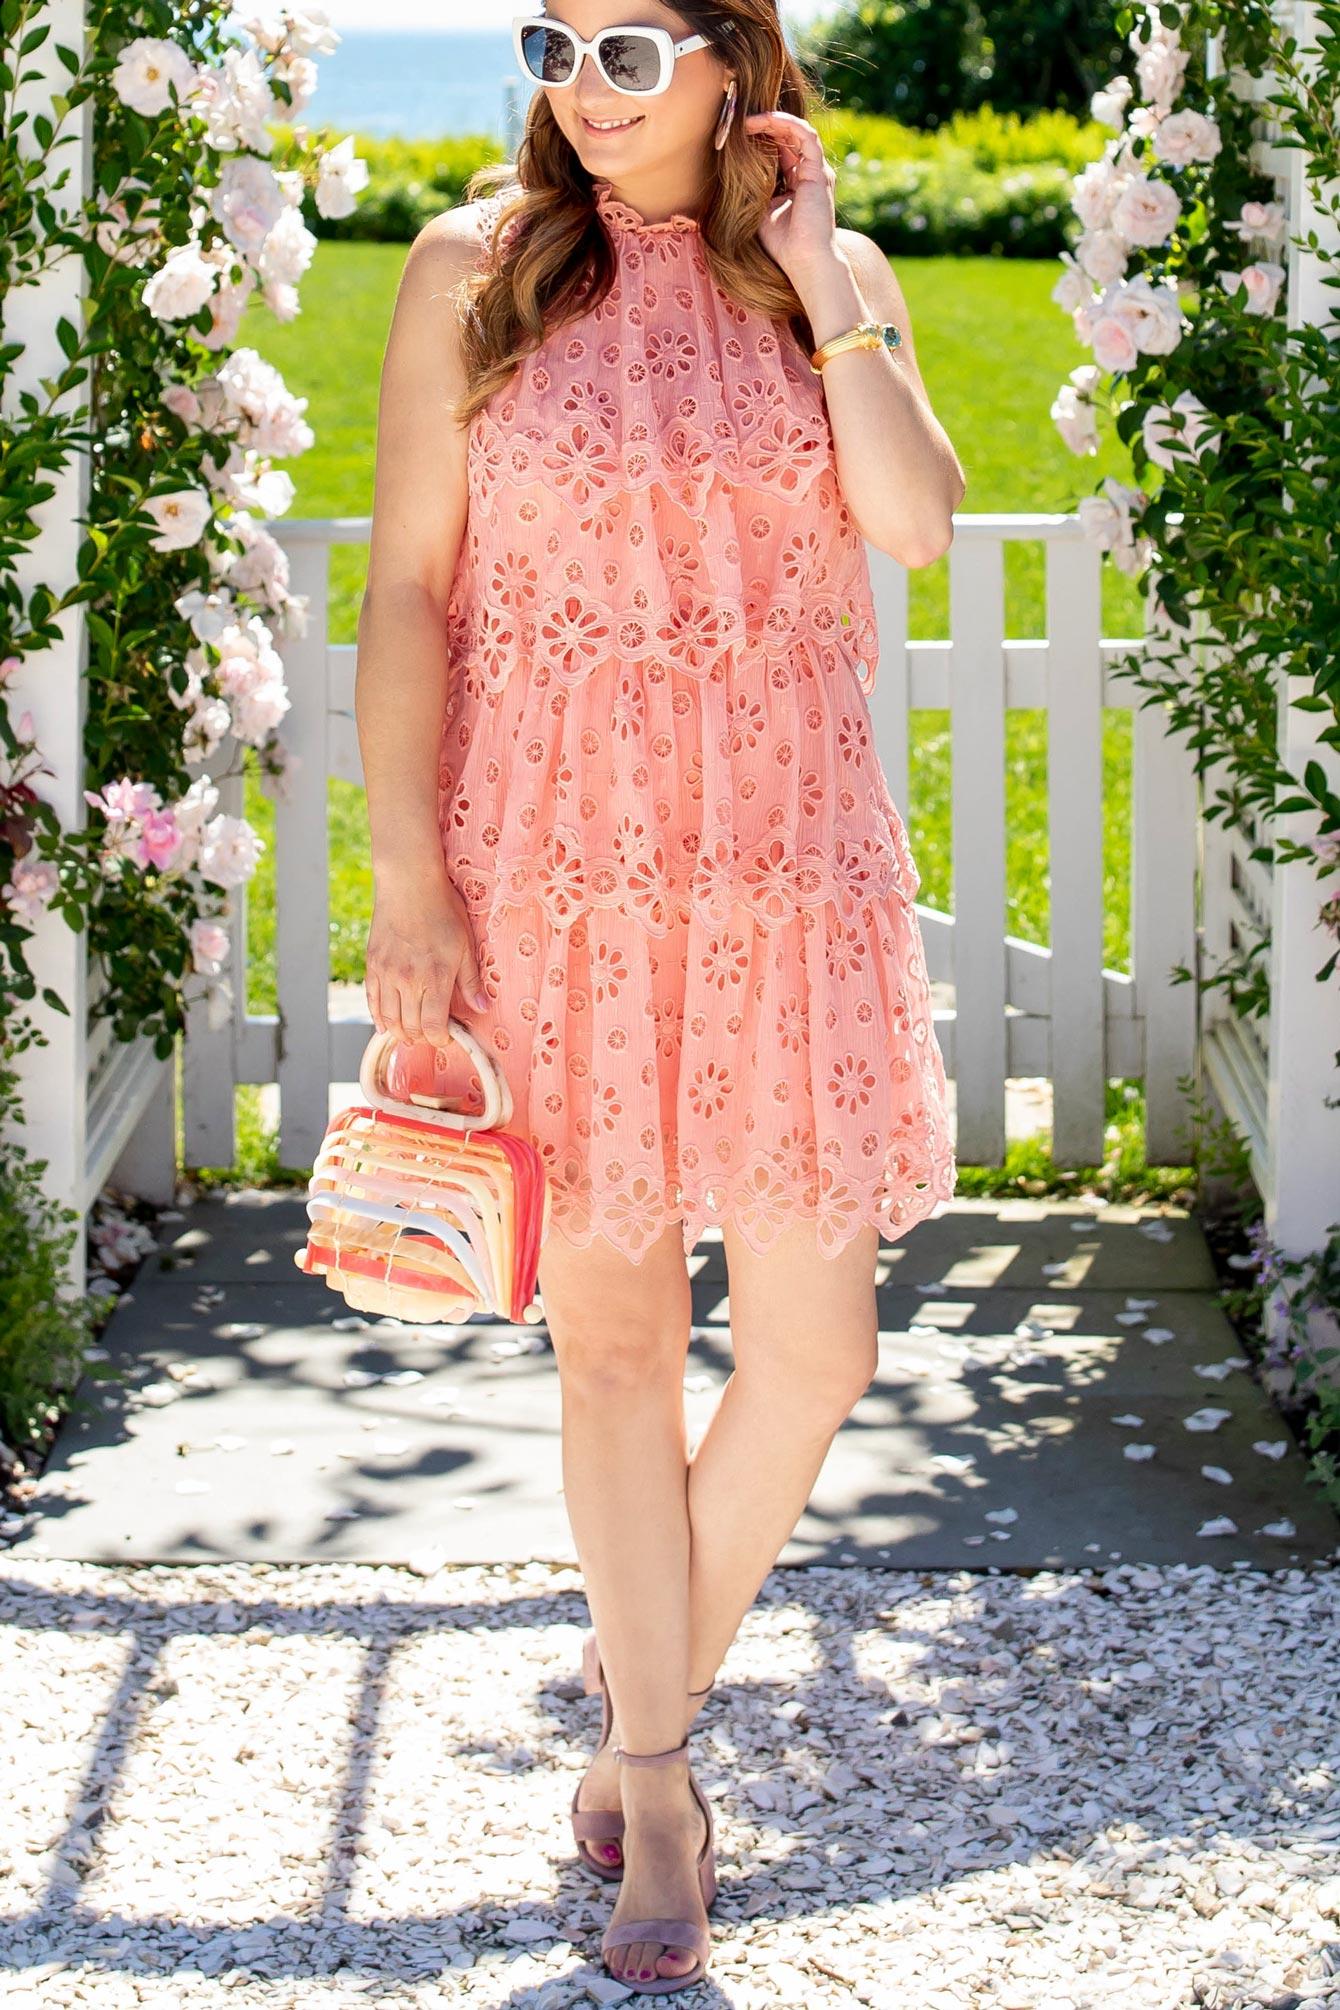 Pink Tiered Eyelet Dress